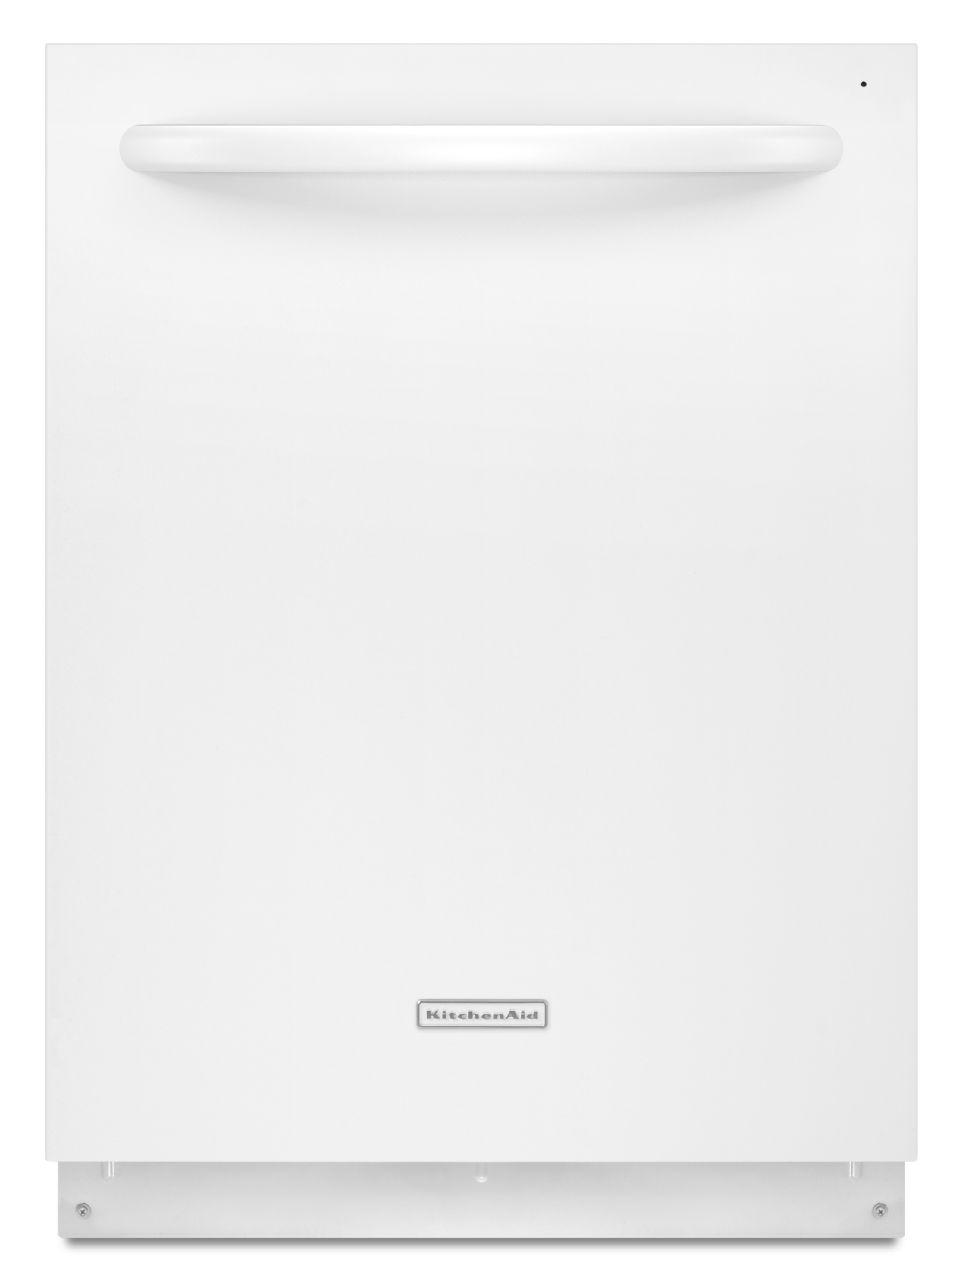 KitchenAid Dishwasher Model KUDE40FXWH4 Parts